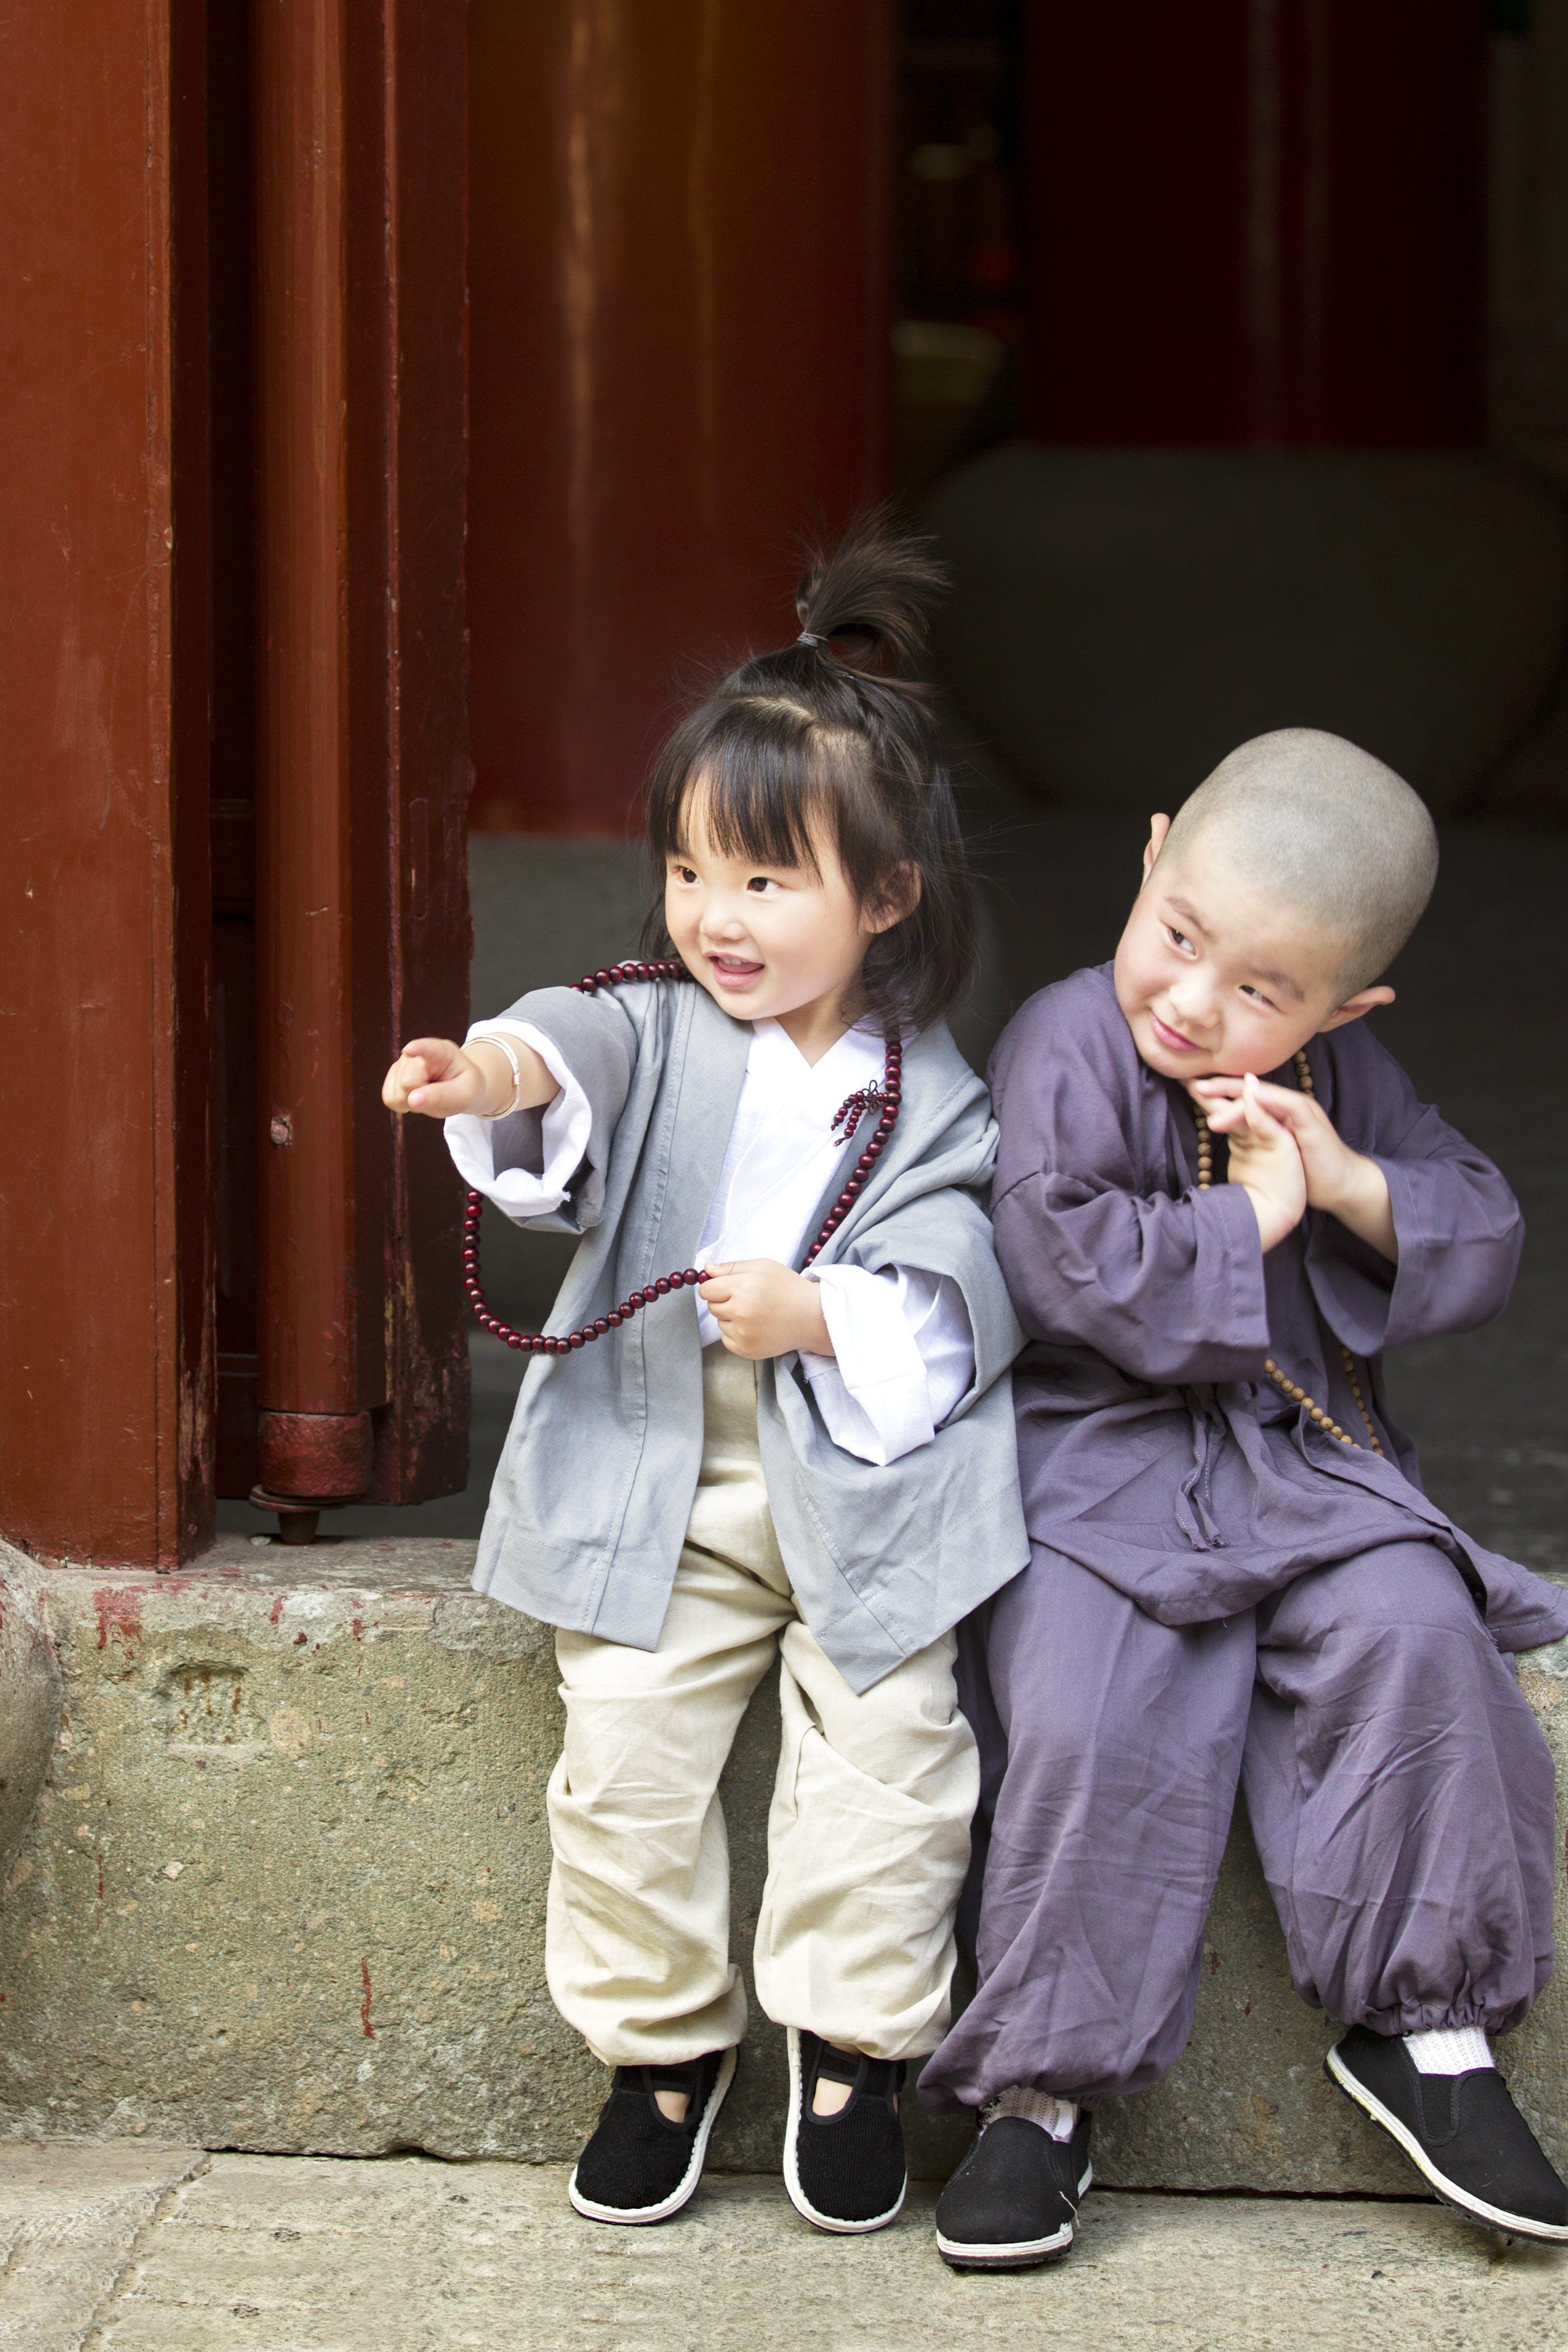 Boy and Girl Sitting on Doorway